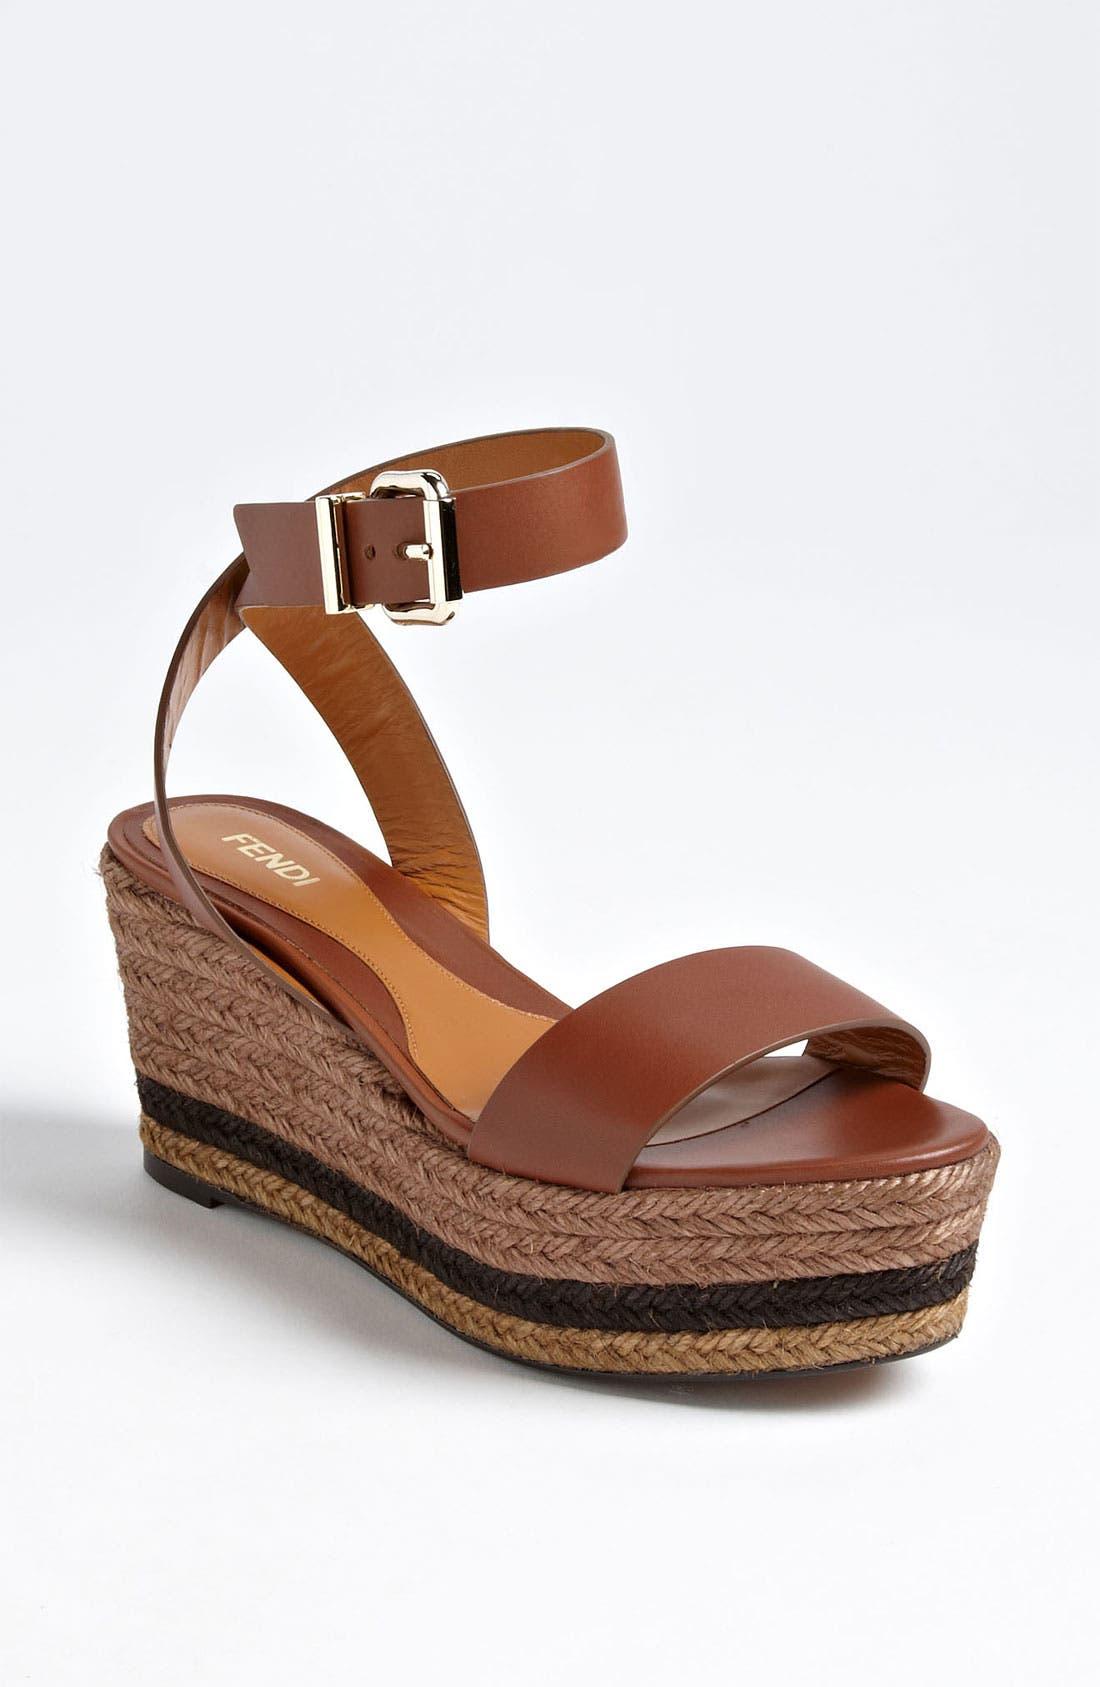 Alternate Image 1 Selected - Fendi 'Pequin' Sandal